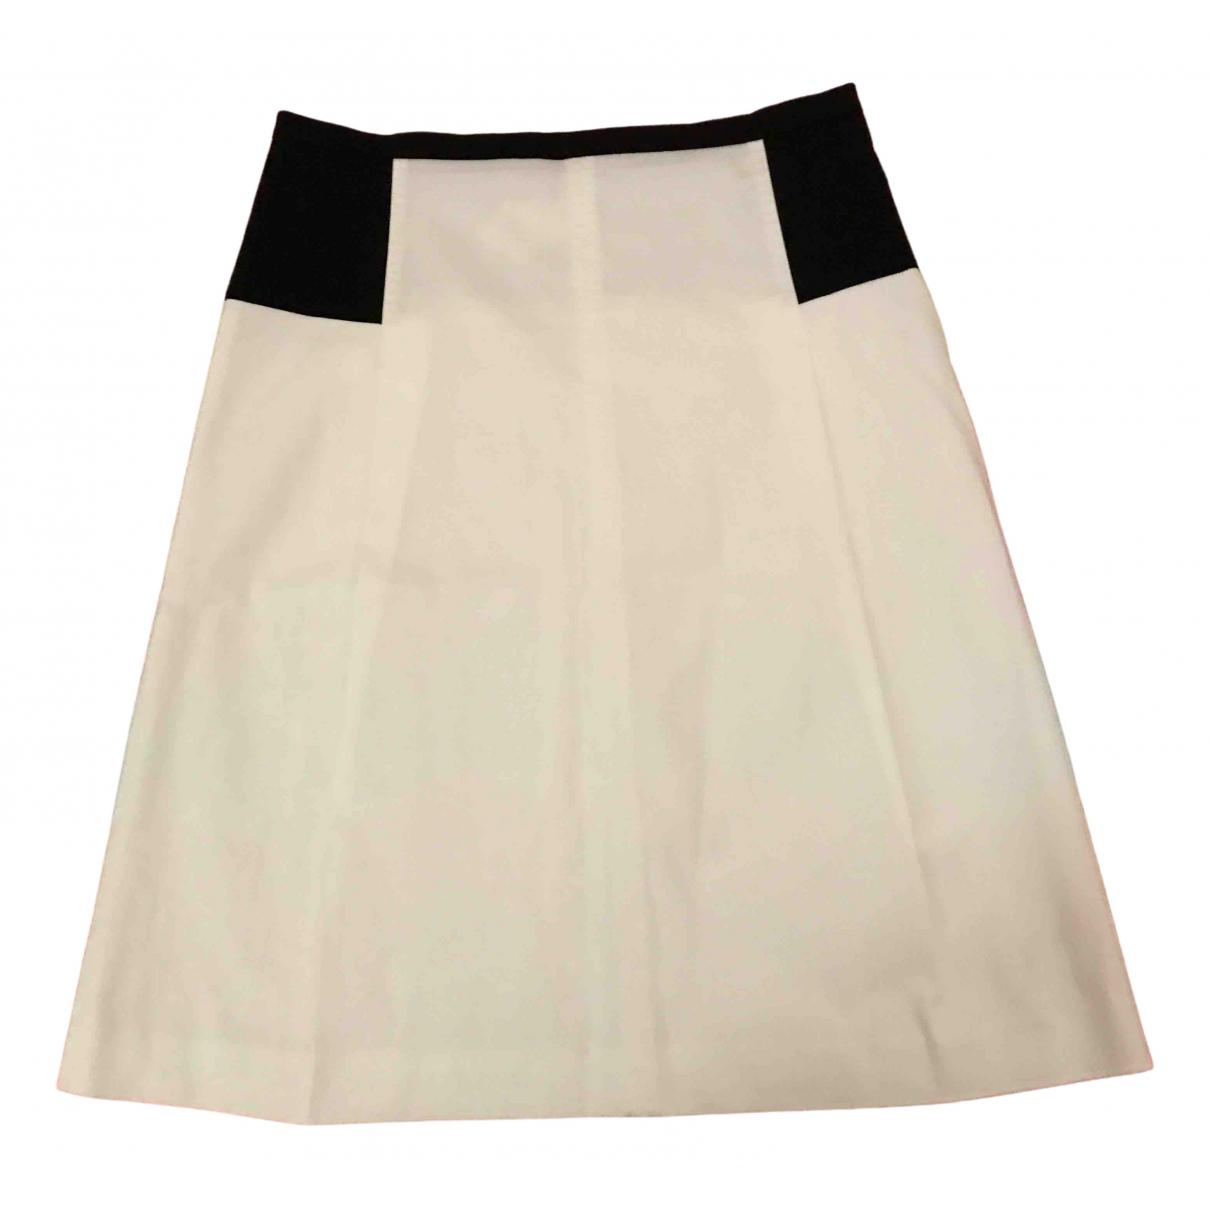 Max Mara Studio \N White Cotton skirt for Women 46 IT